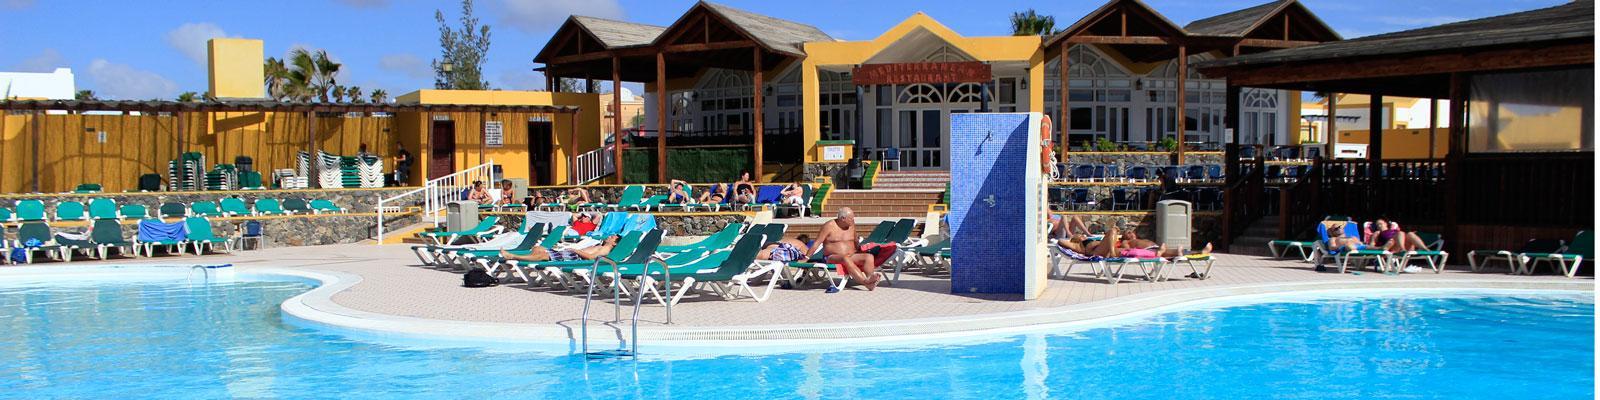 Economico villaggio vacanza per famiglie a Fuerteventura Caleta Dorada